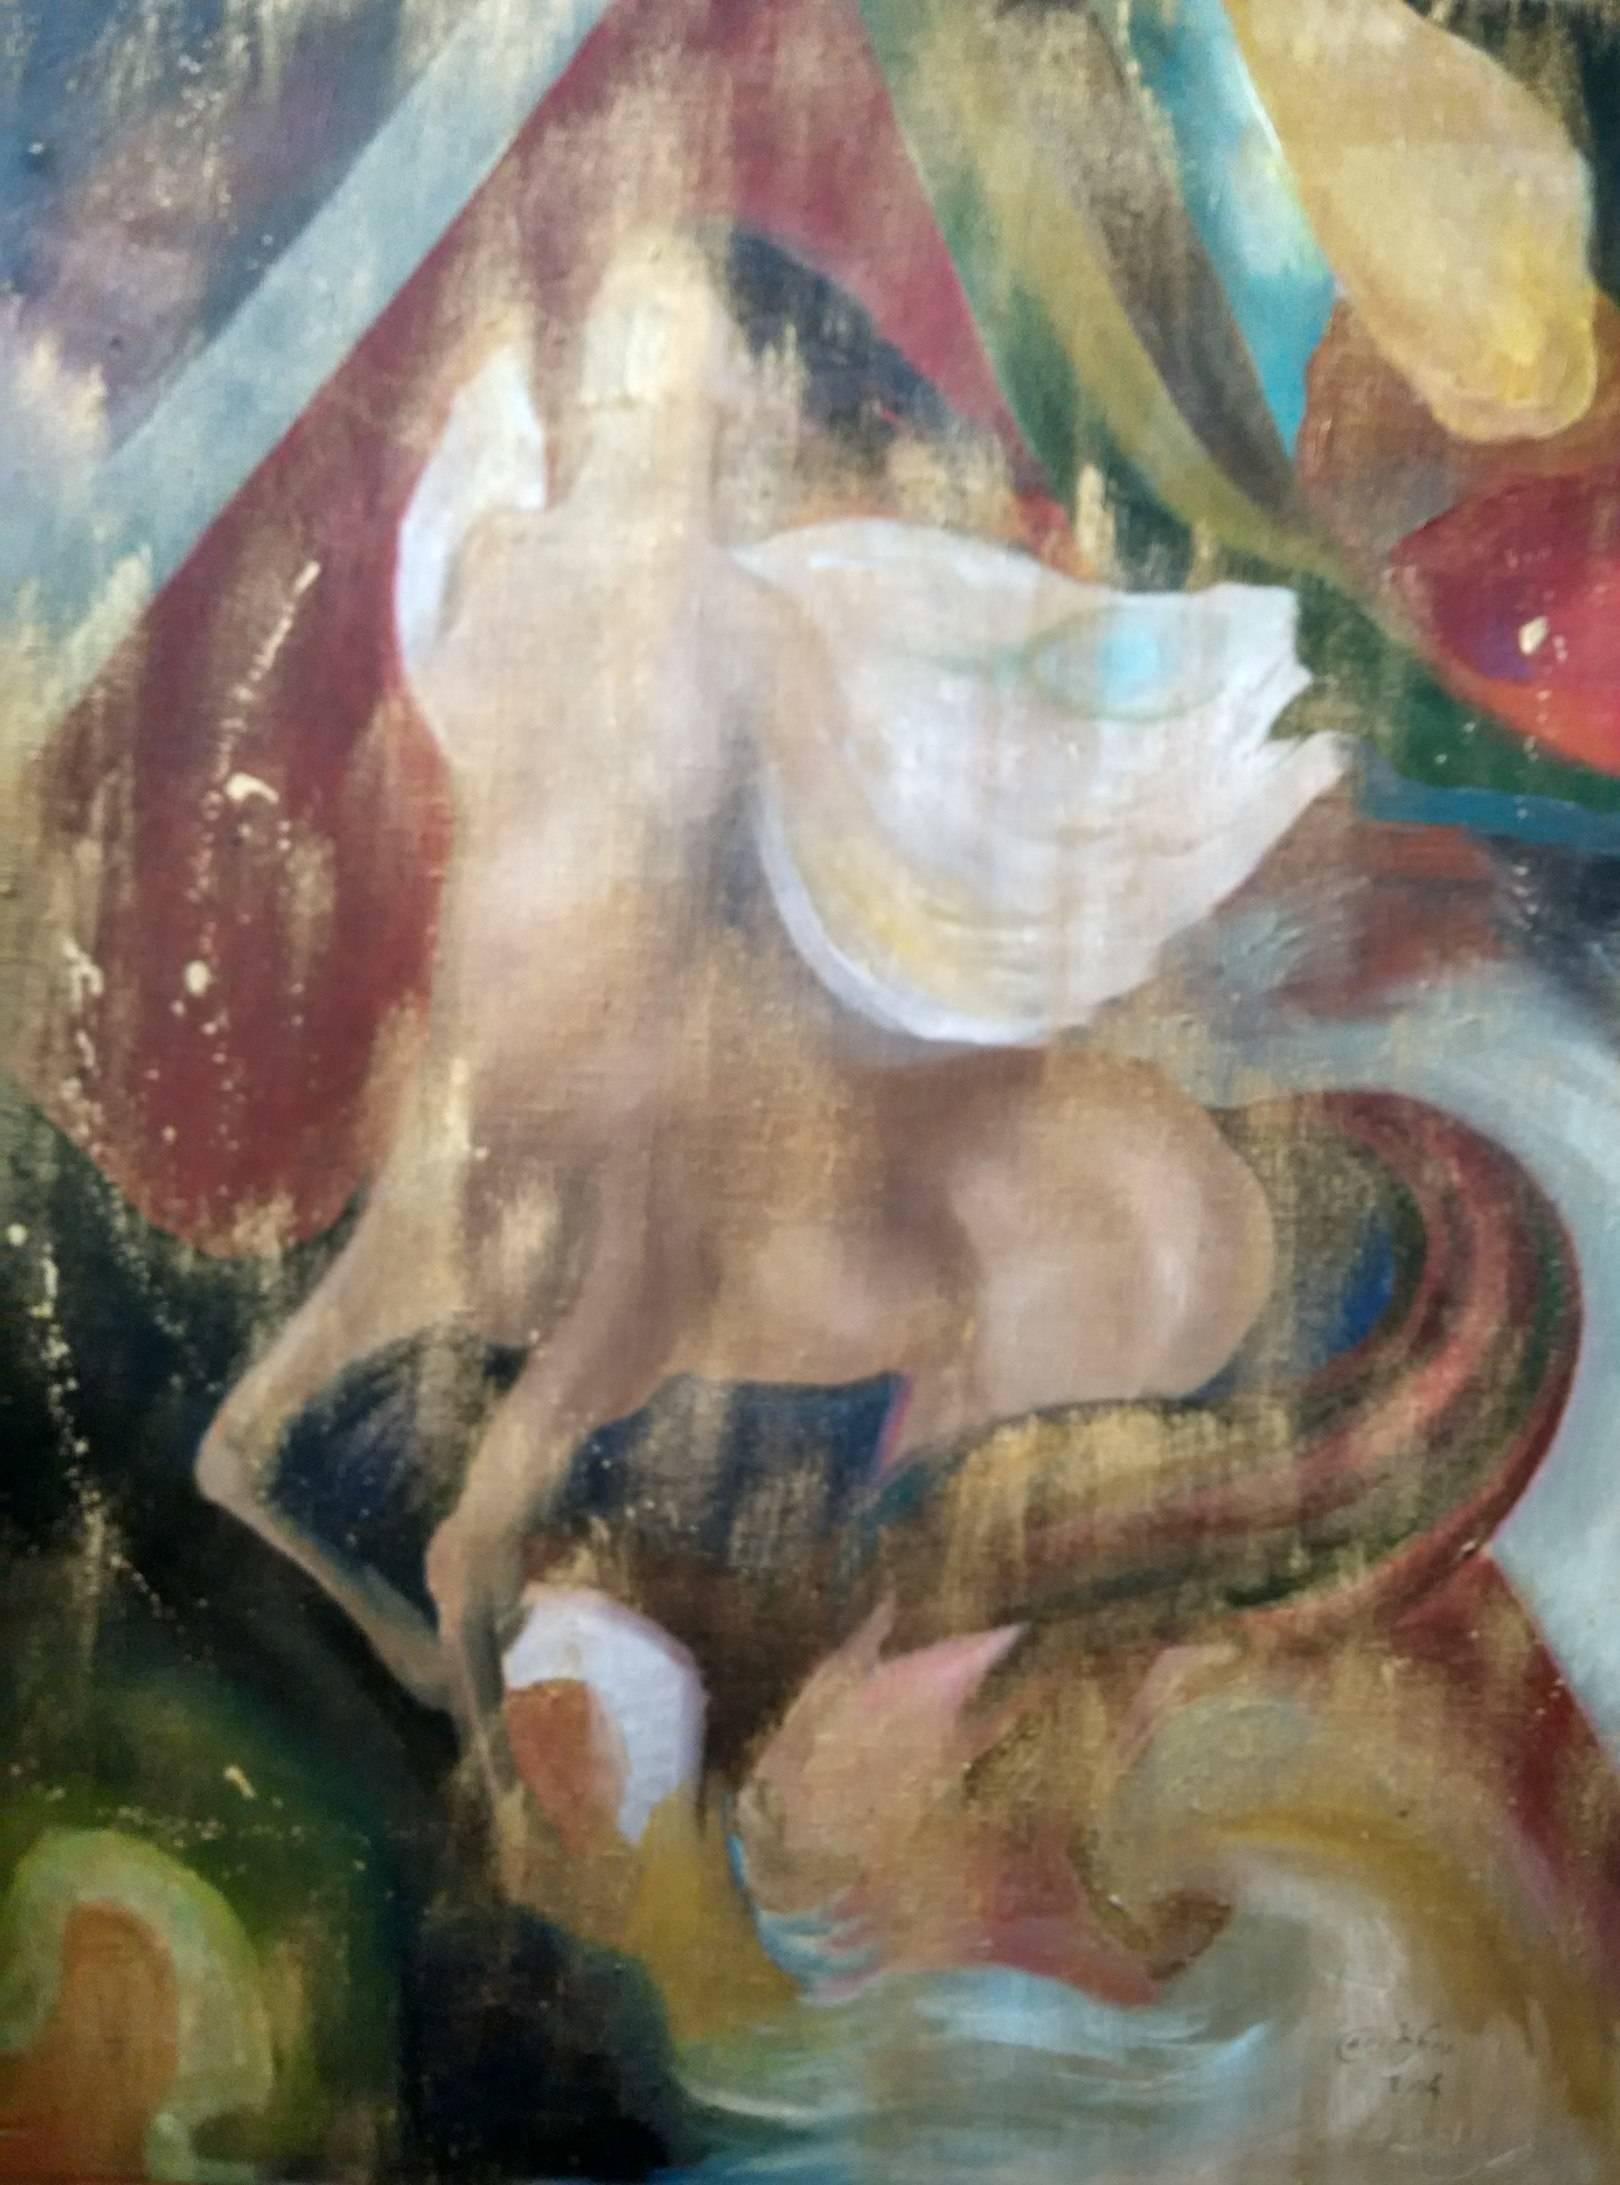 «Полет кентавра»                холст, масло «Flying of the Centaur»        oil on canvas                                                   100x90,  2004